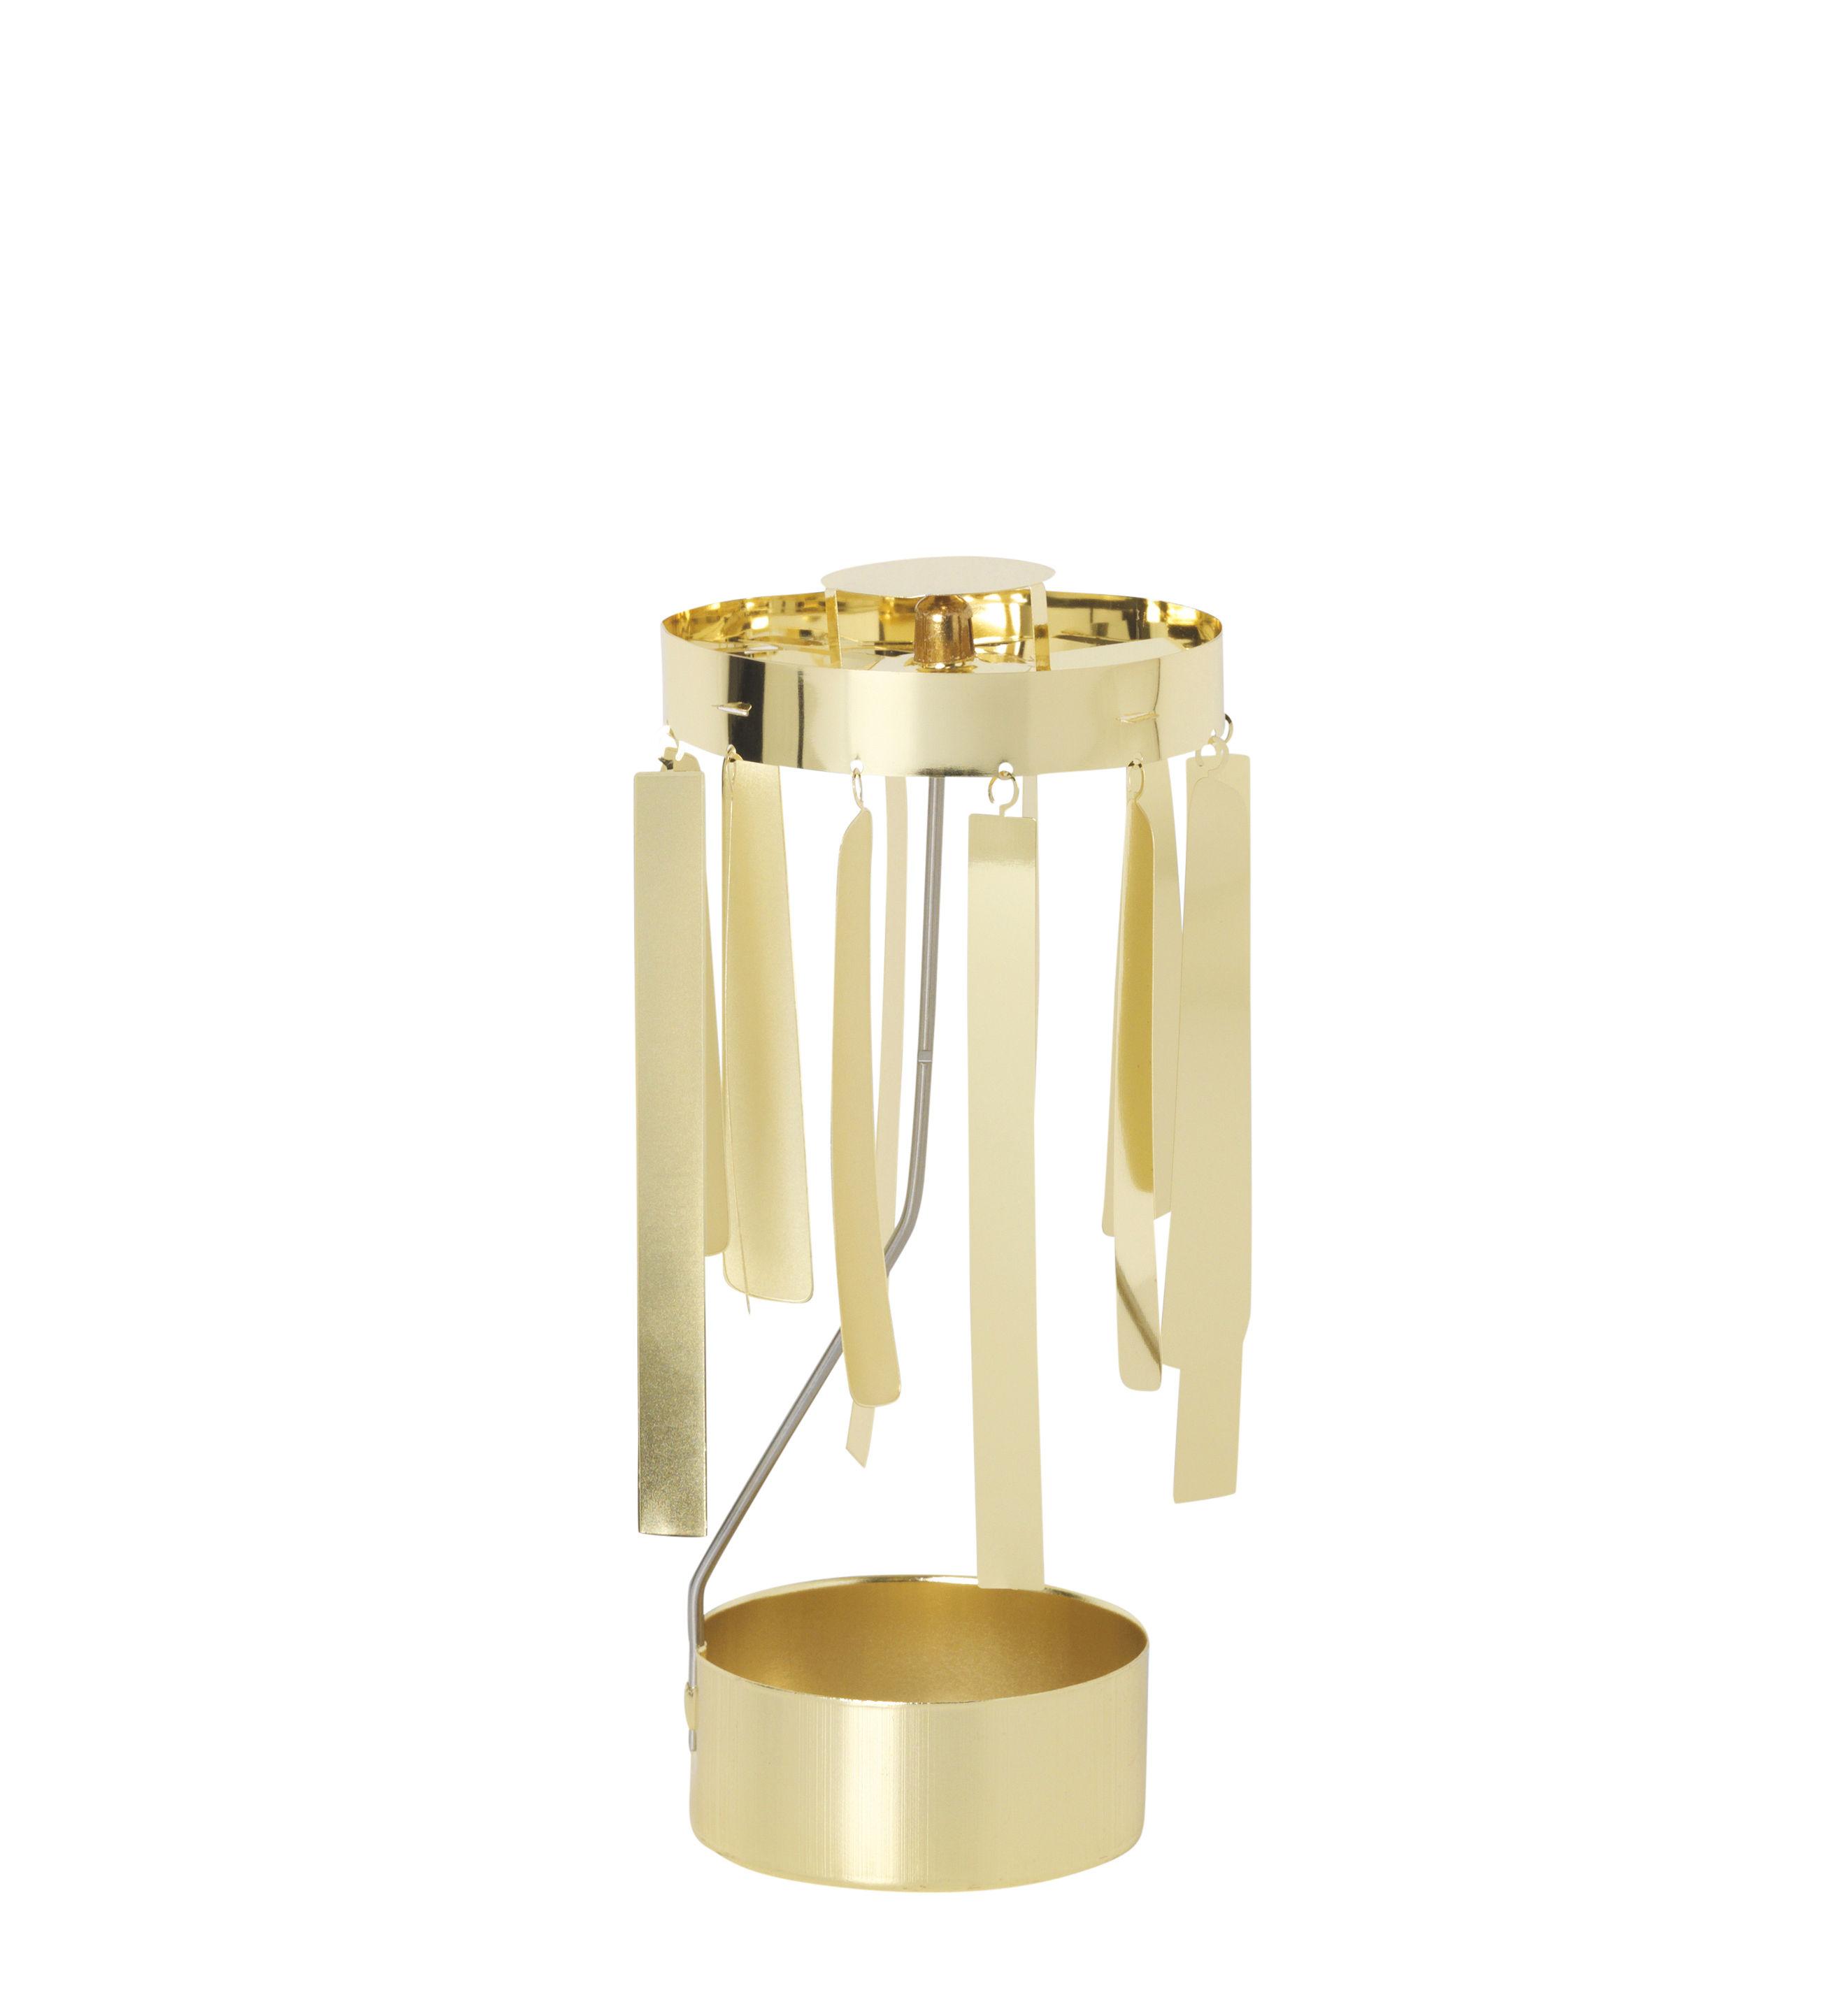 Decoration - Home Accessories - Tangle Carillon de Noël by Ferm Living - Gold - Metal